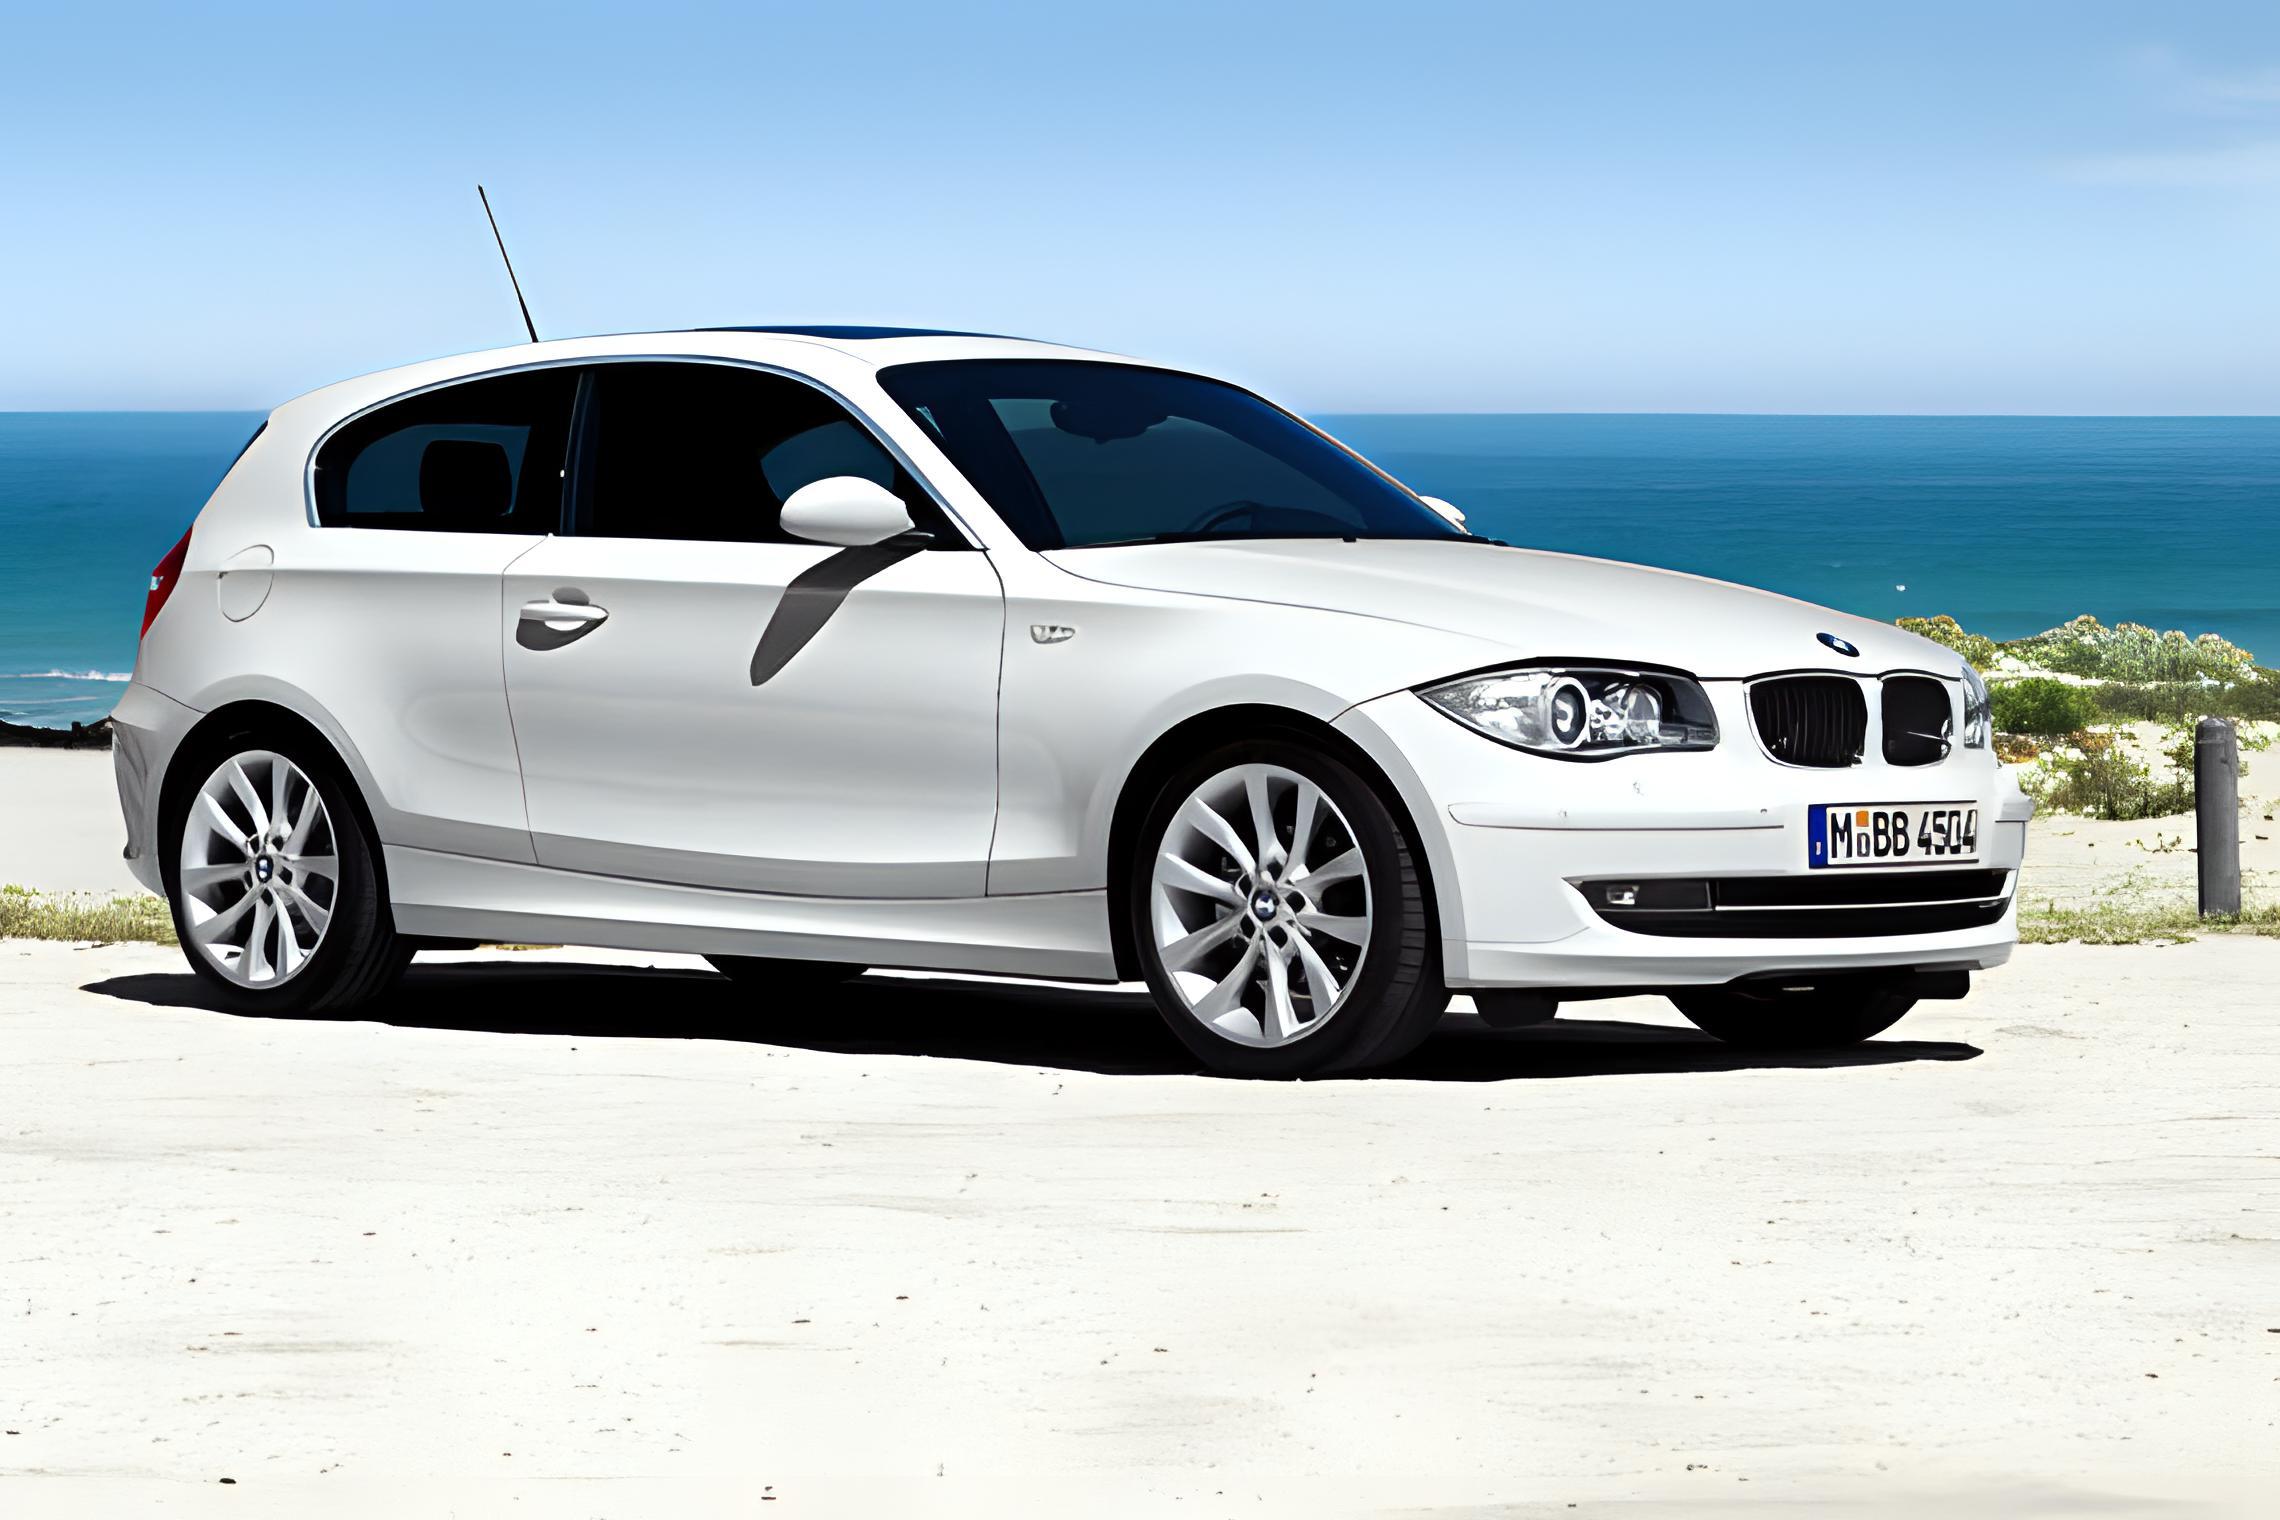 BMW 1er Dreitürer technical details, history, photos on